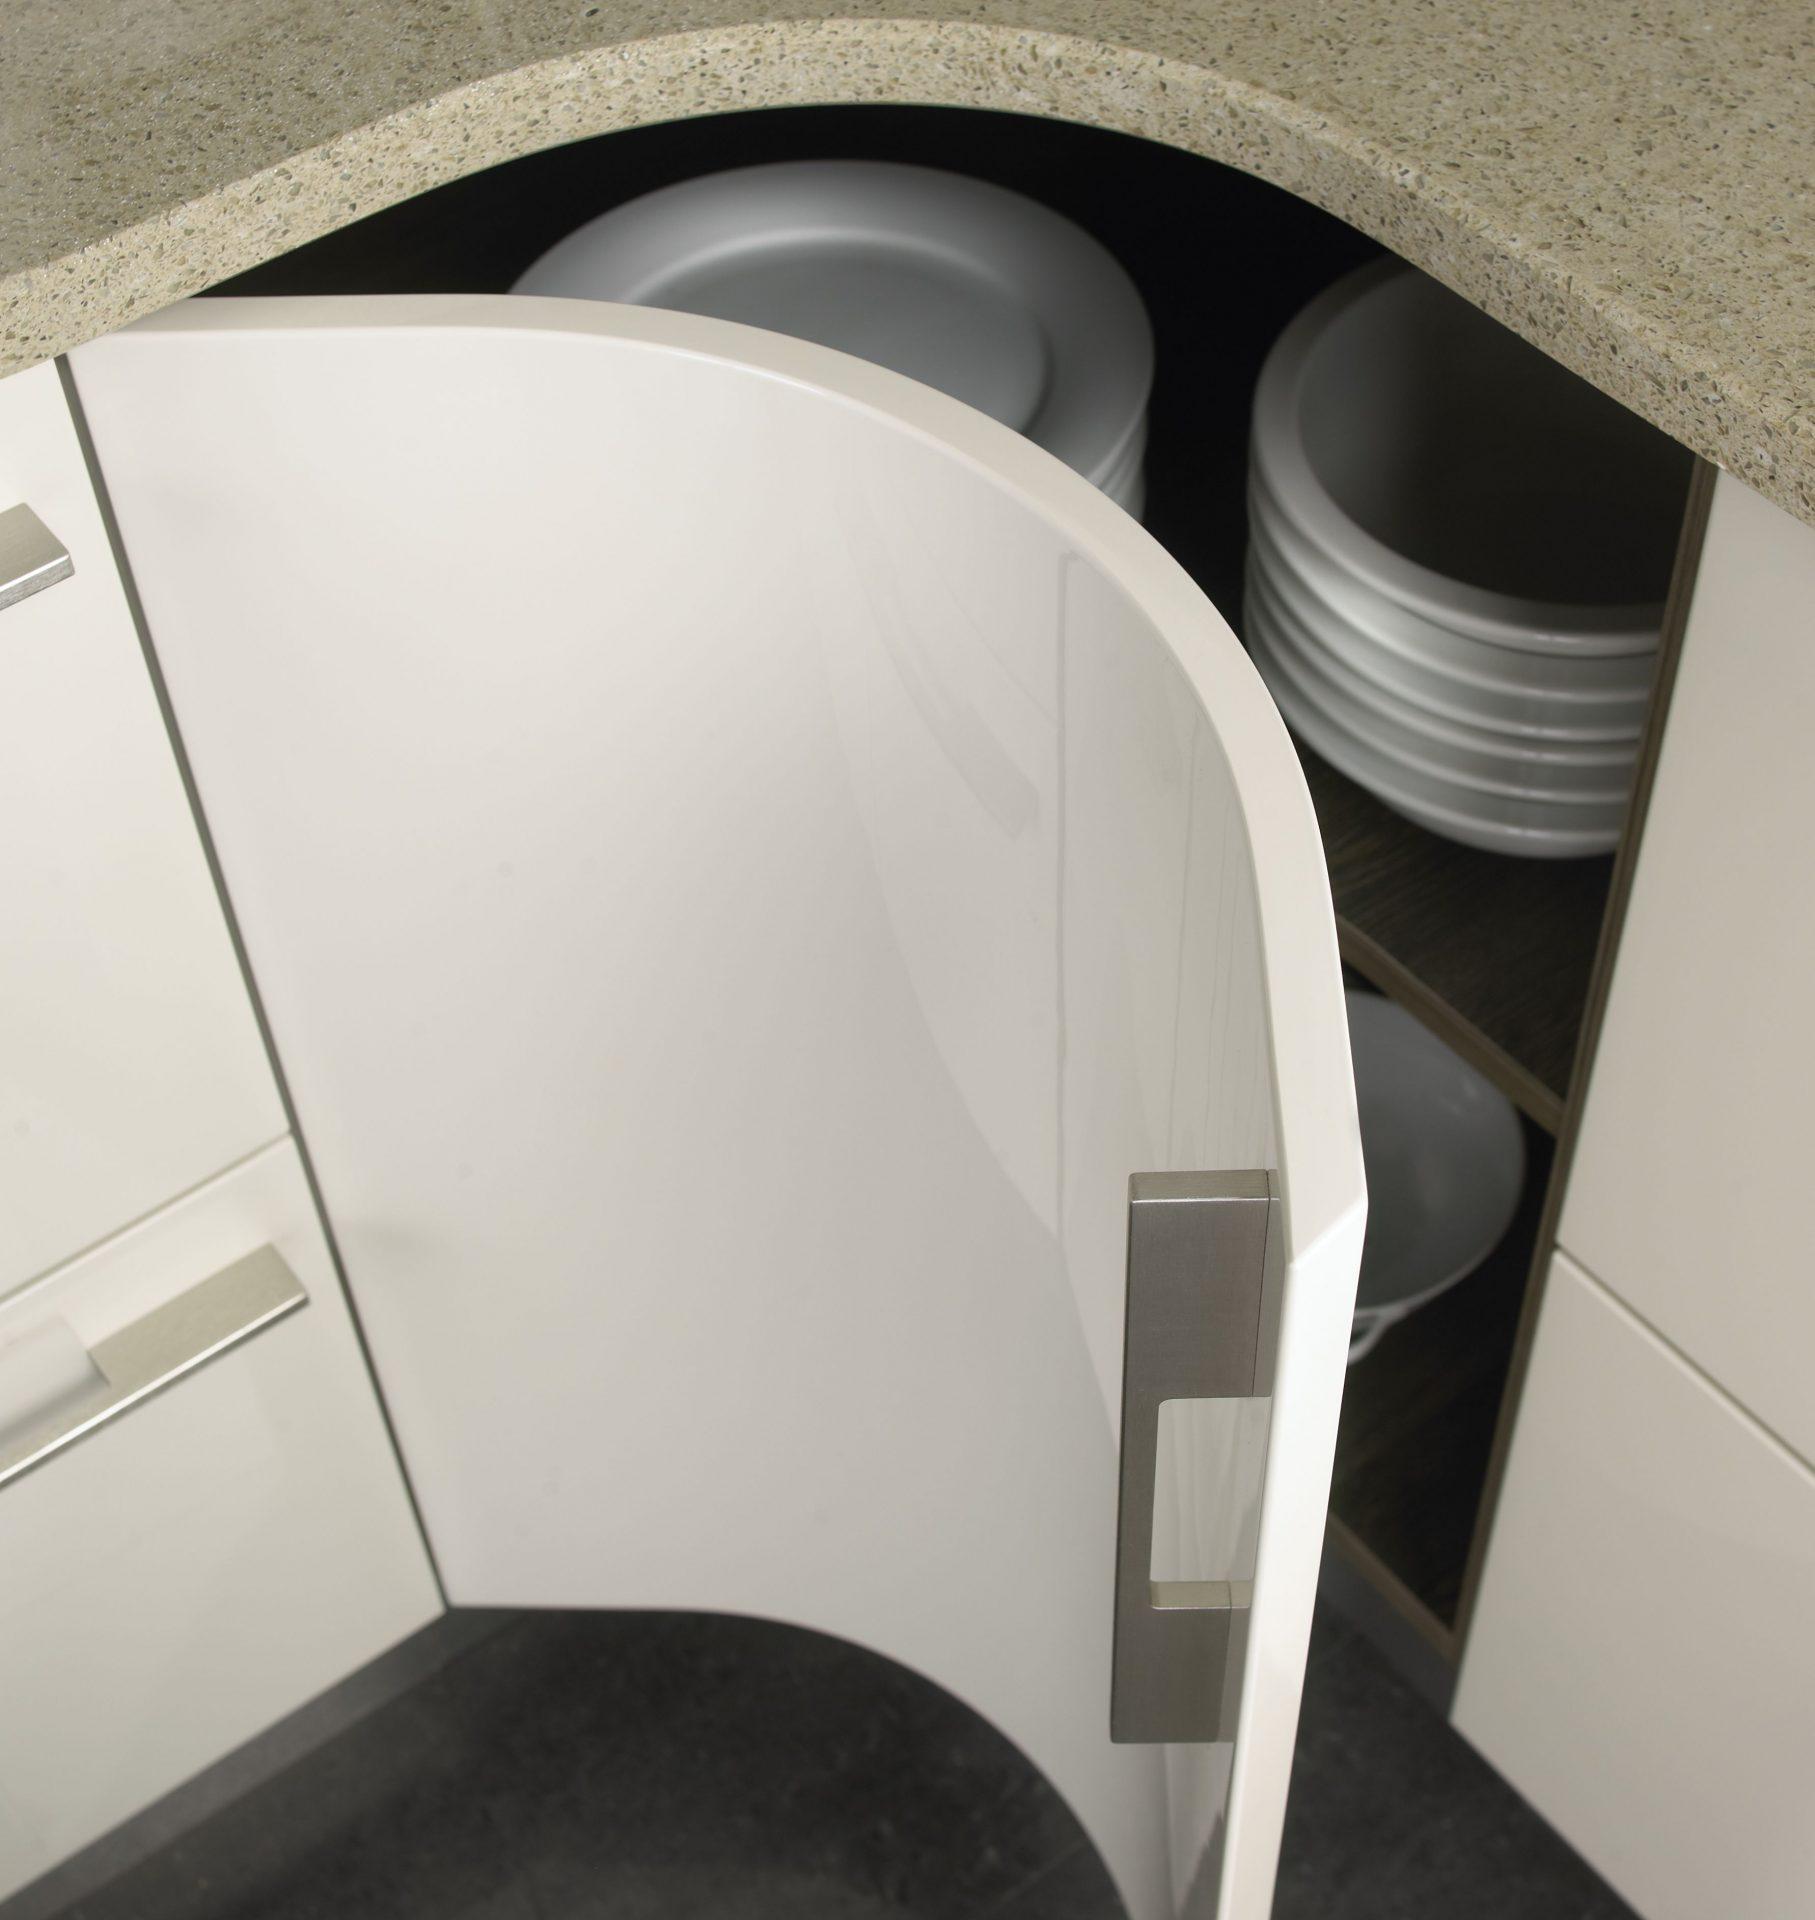 Pergamon Gloss Internal Curved Base Unit